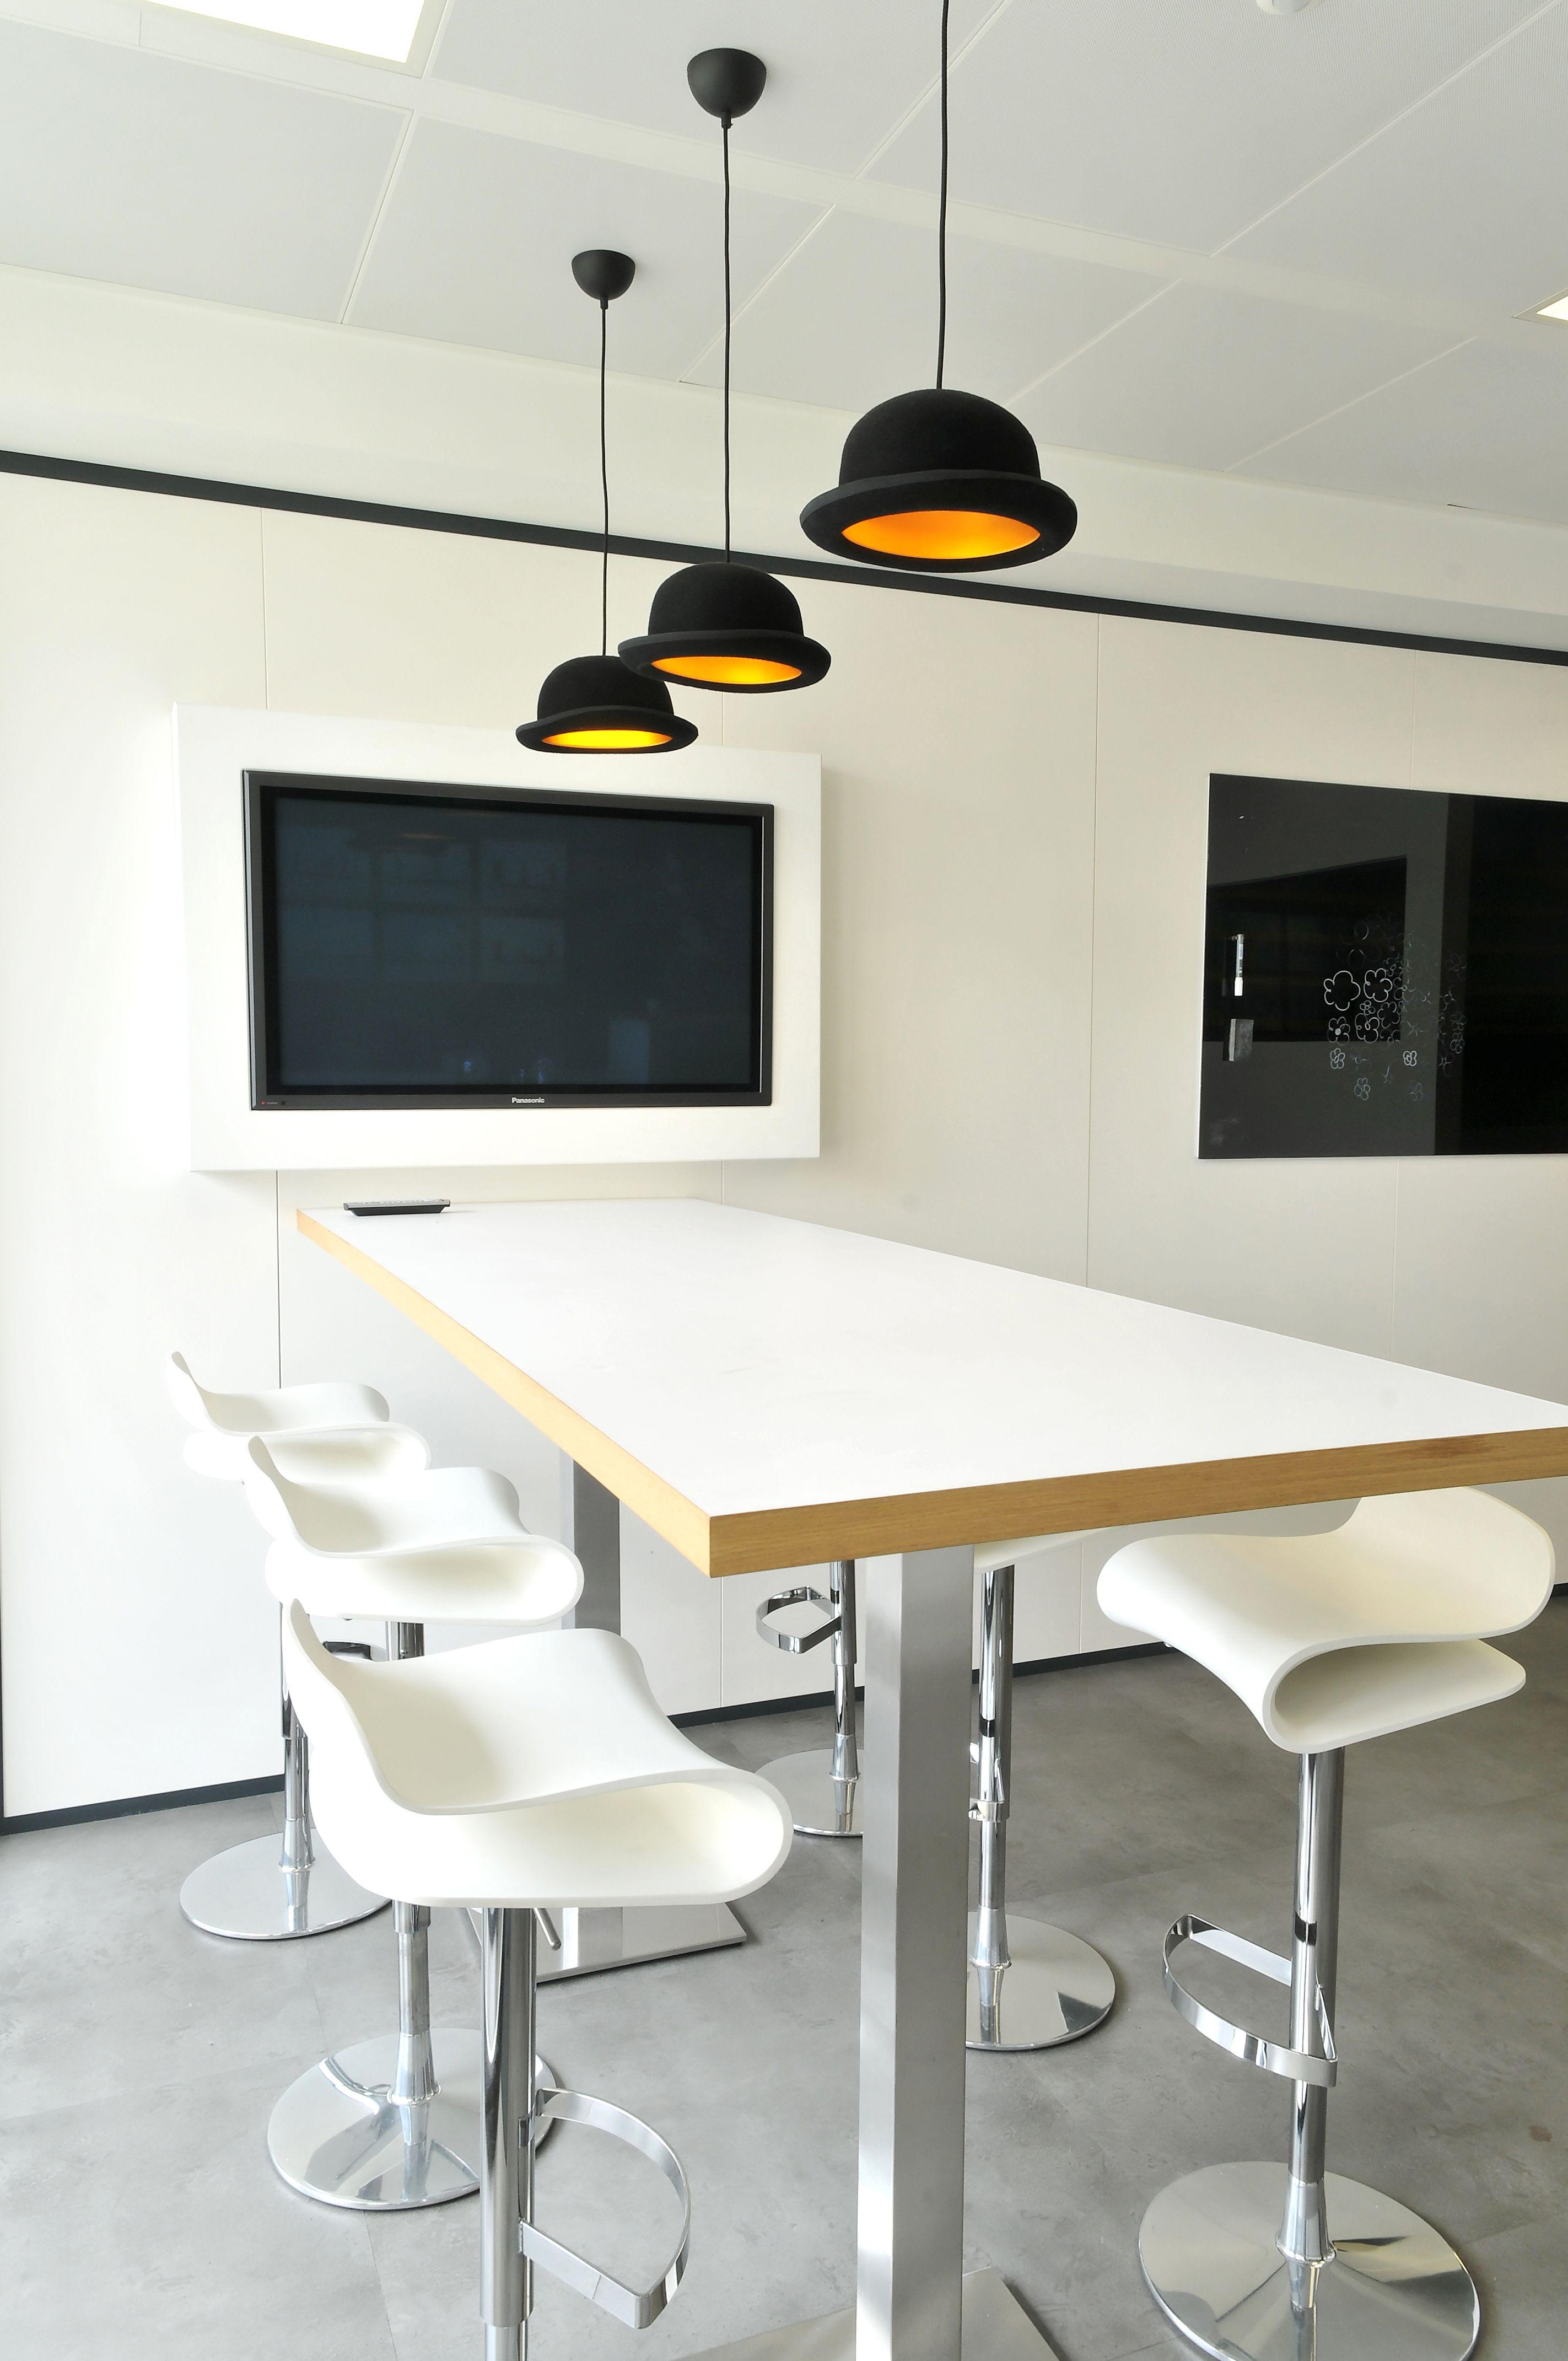 comment bien choisir son mobilier cafeteria design by cleram style design